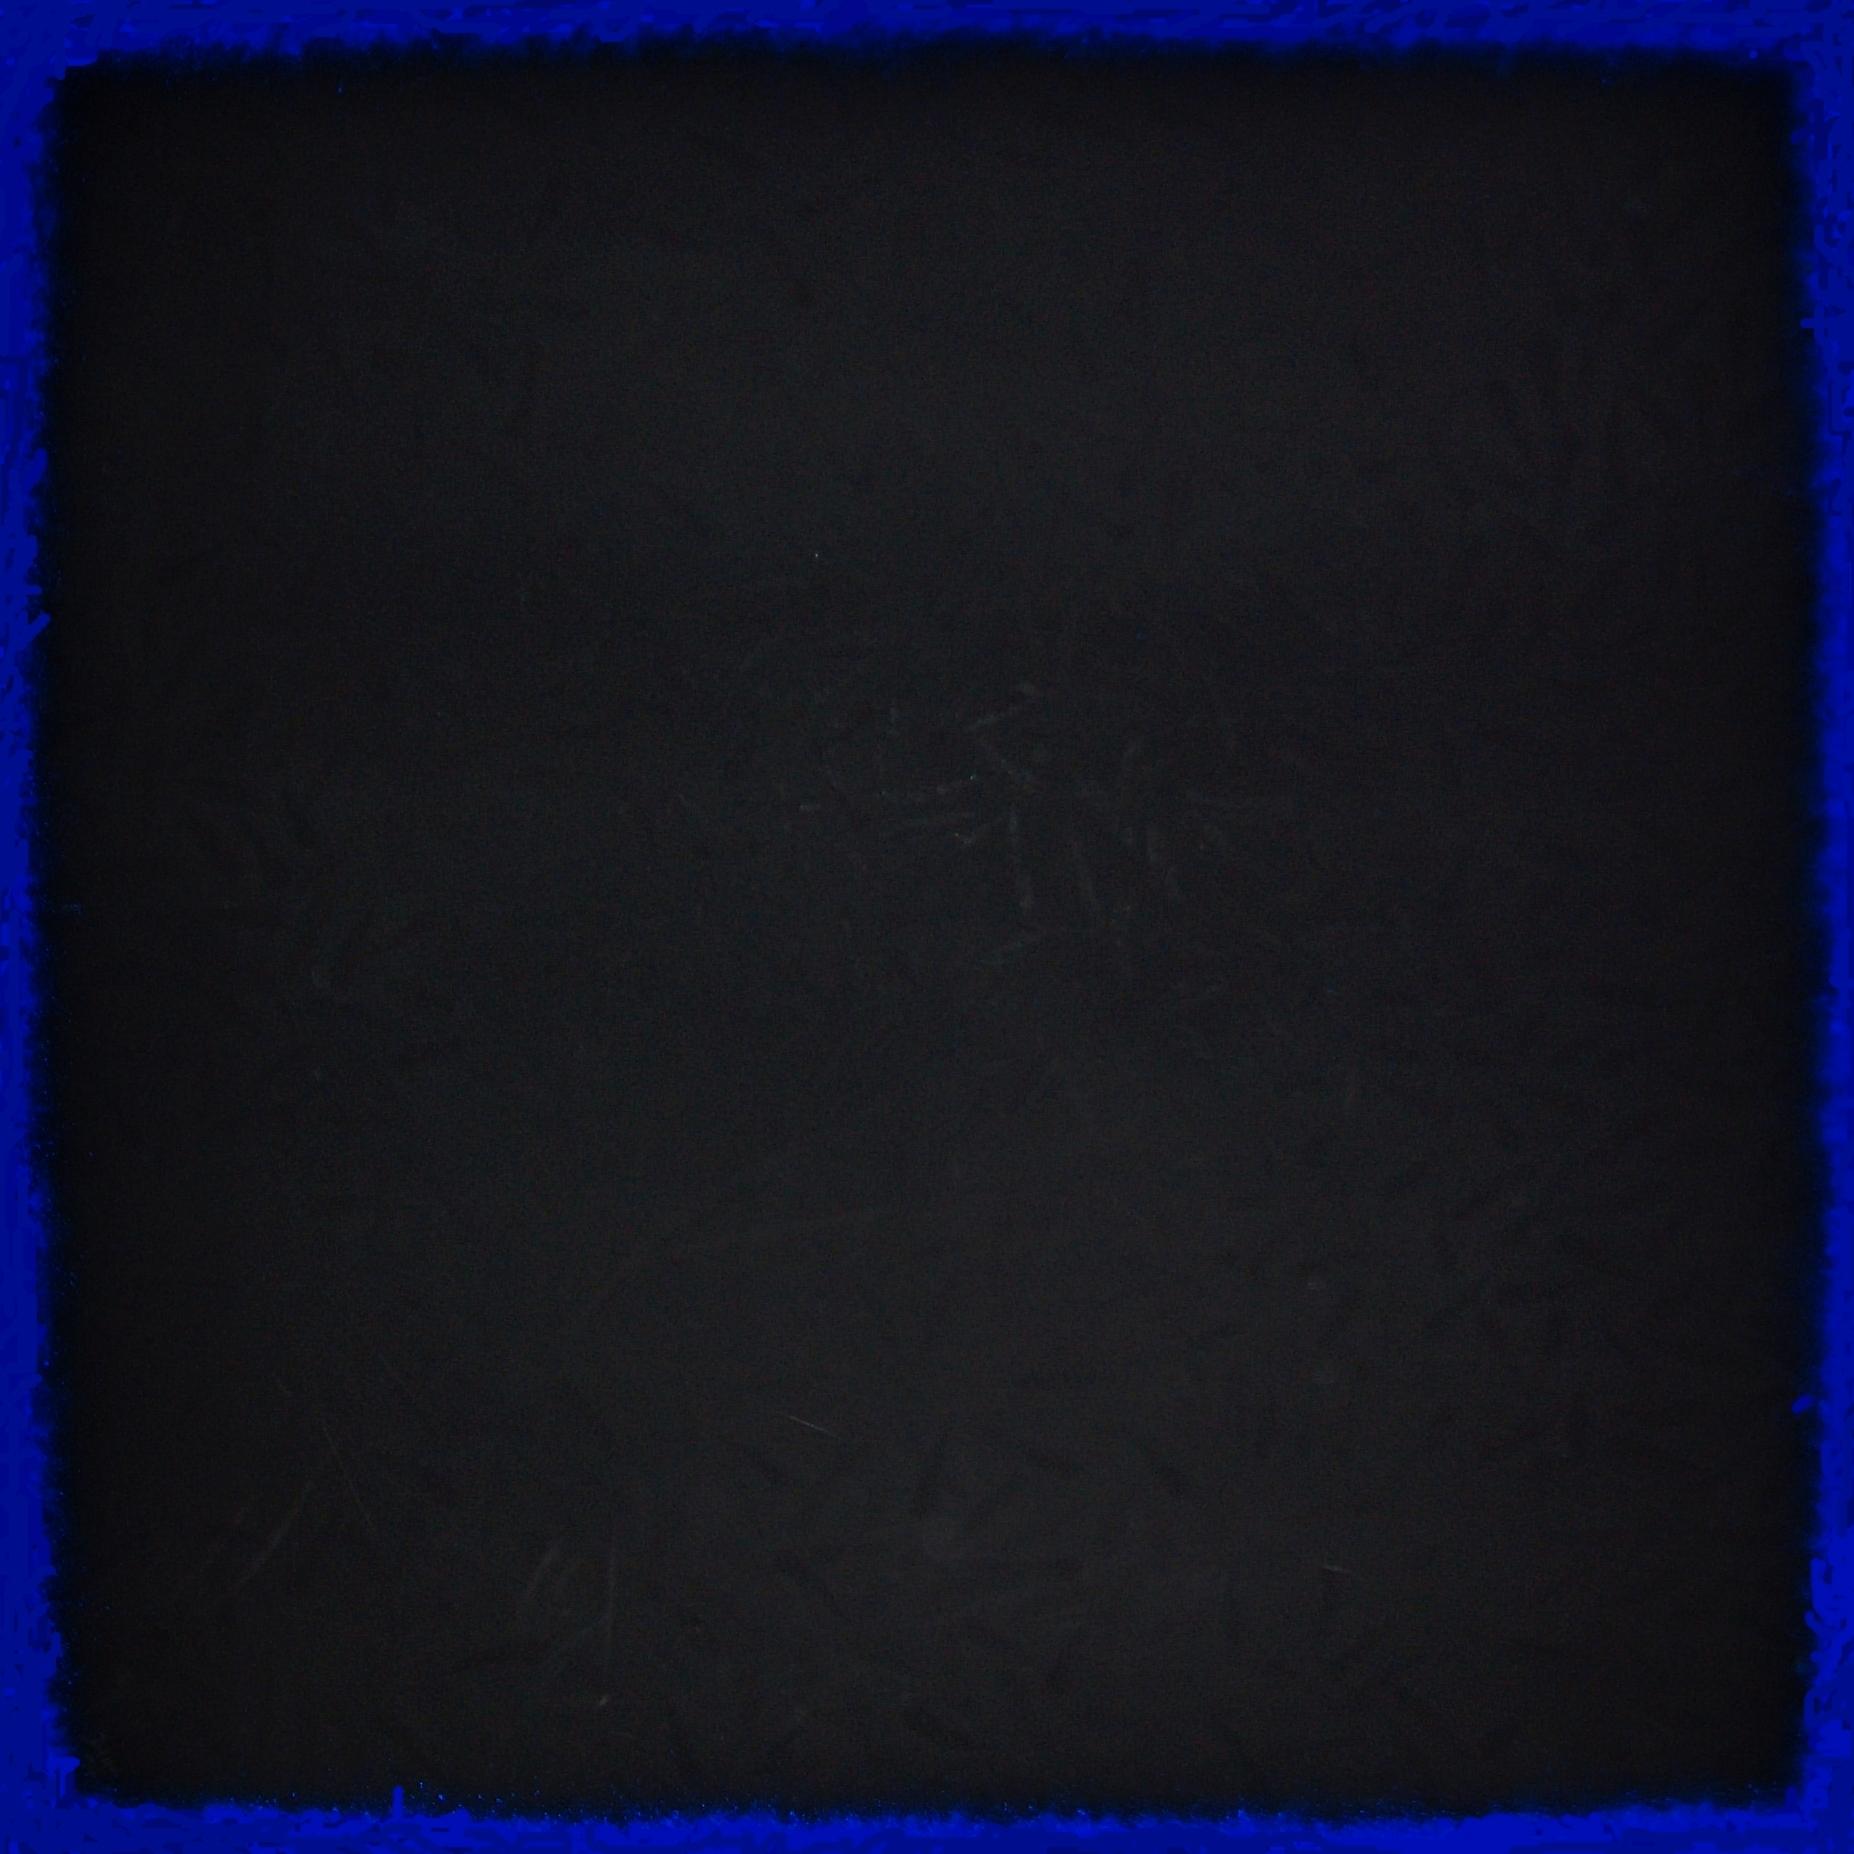 HPIM1710-frg.-paint border.jpg